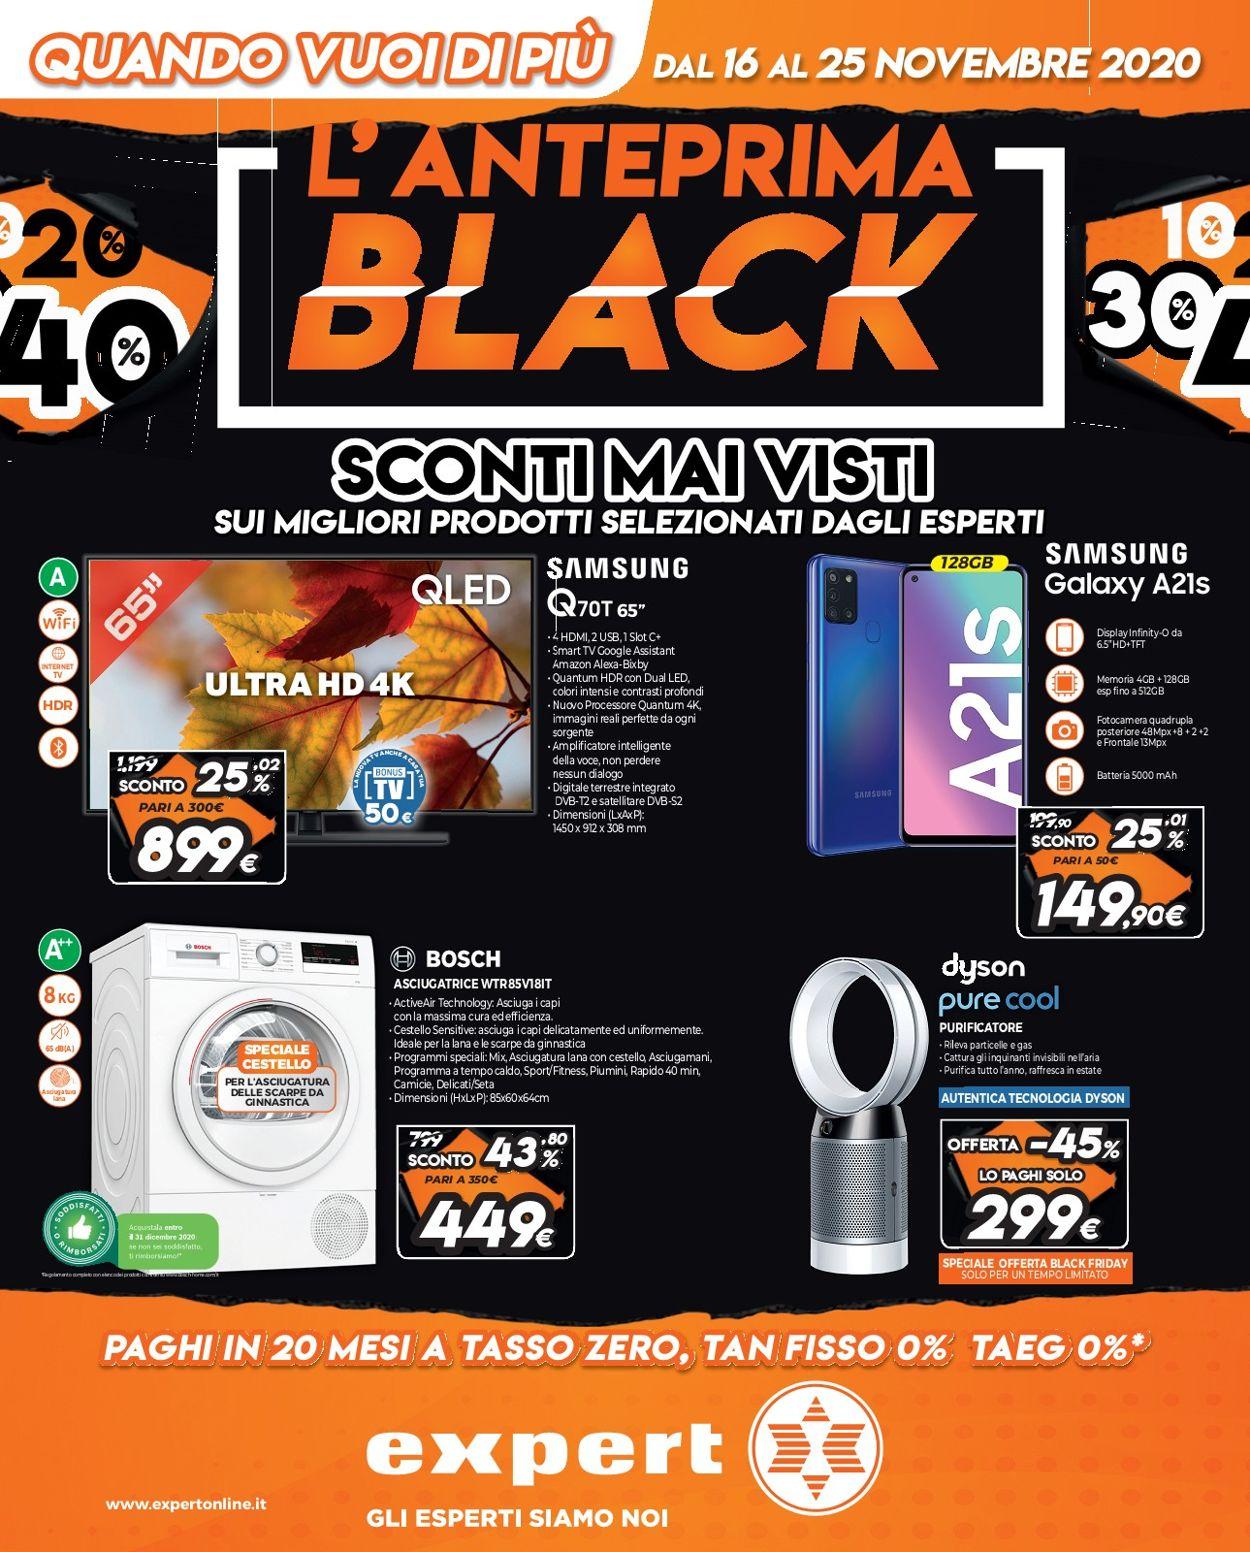 Volantino Iperal Black Friday 2020 - Offerte 16/11-25/11/2020